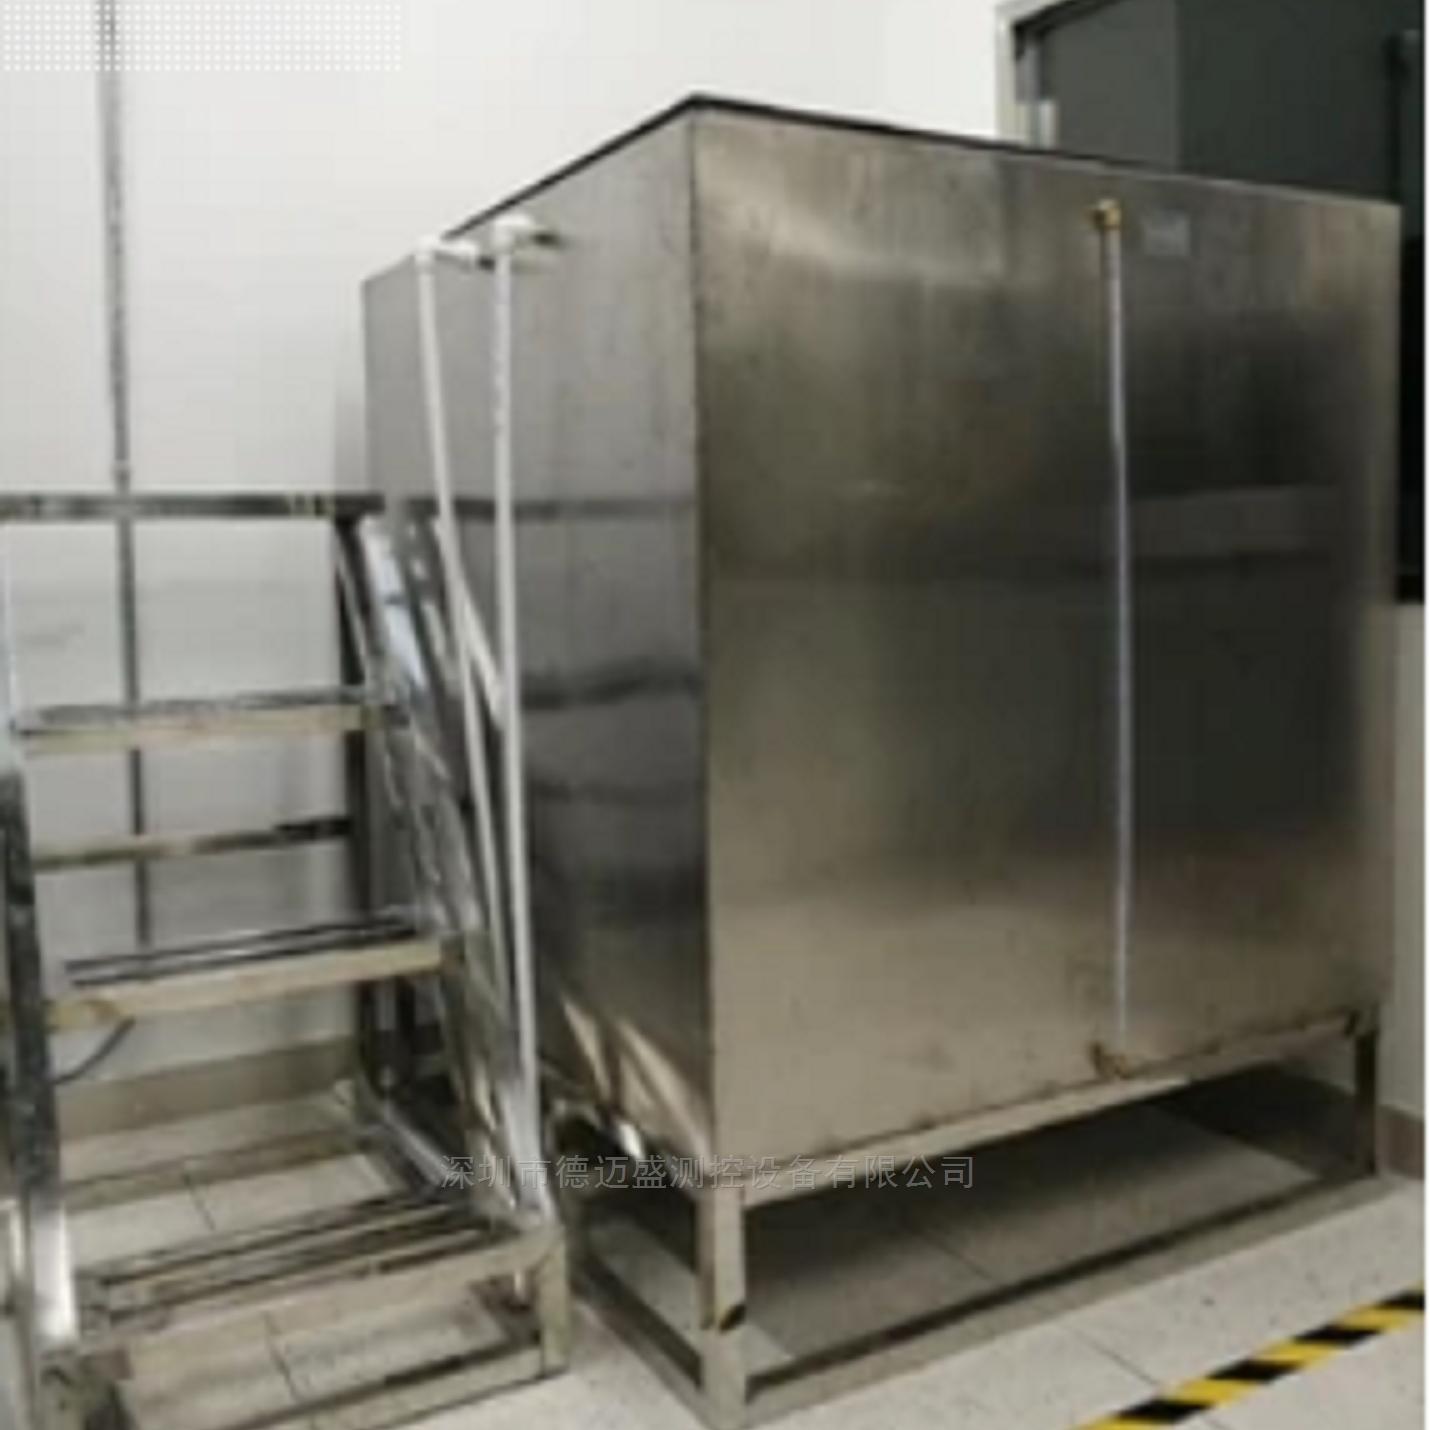 GB4208 IPX7防浸水试验机